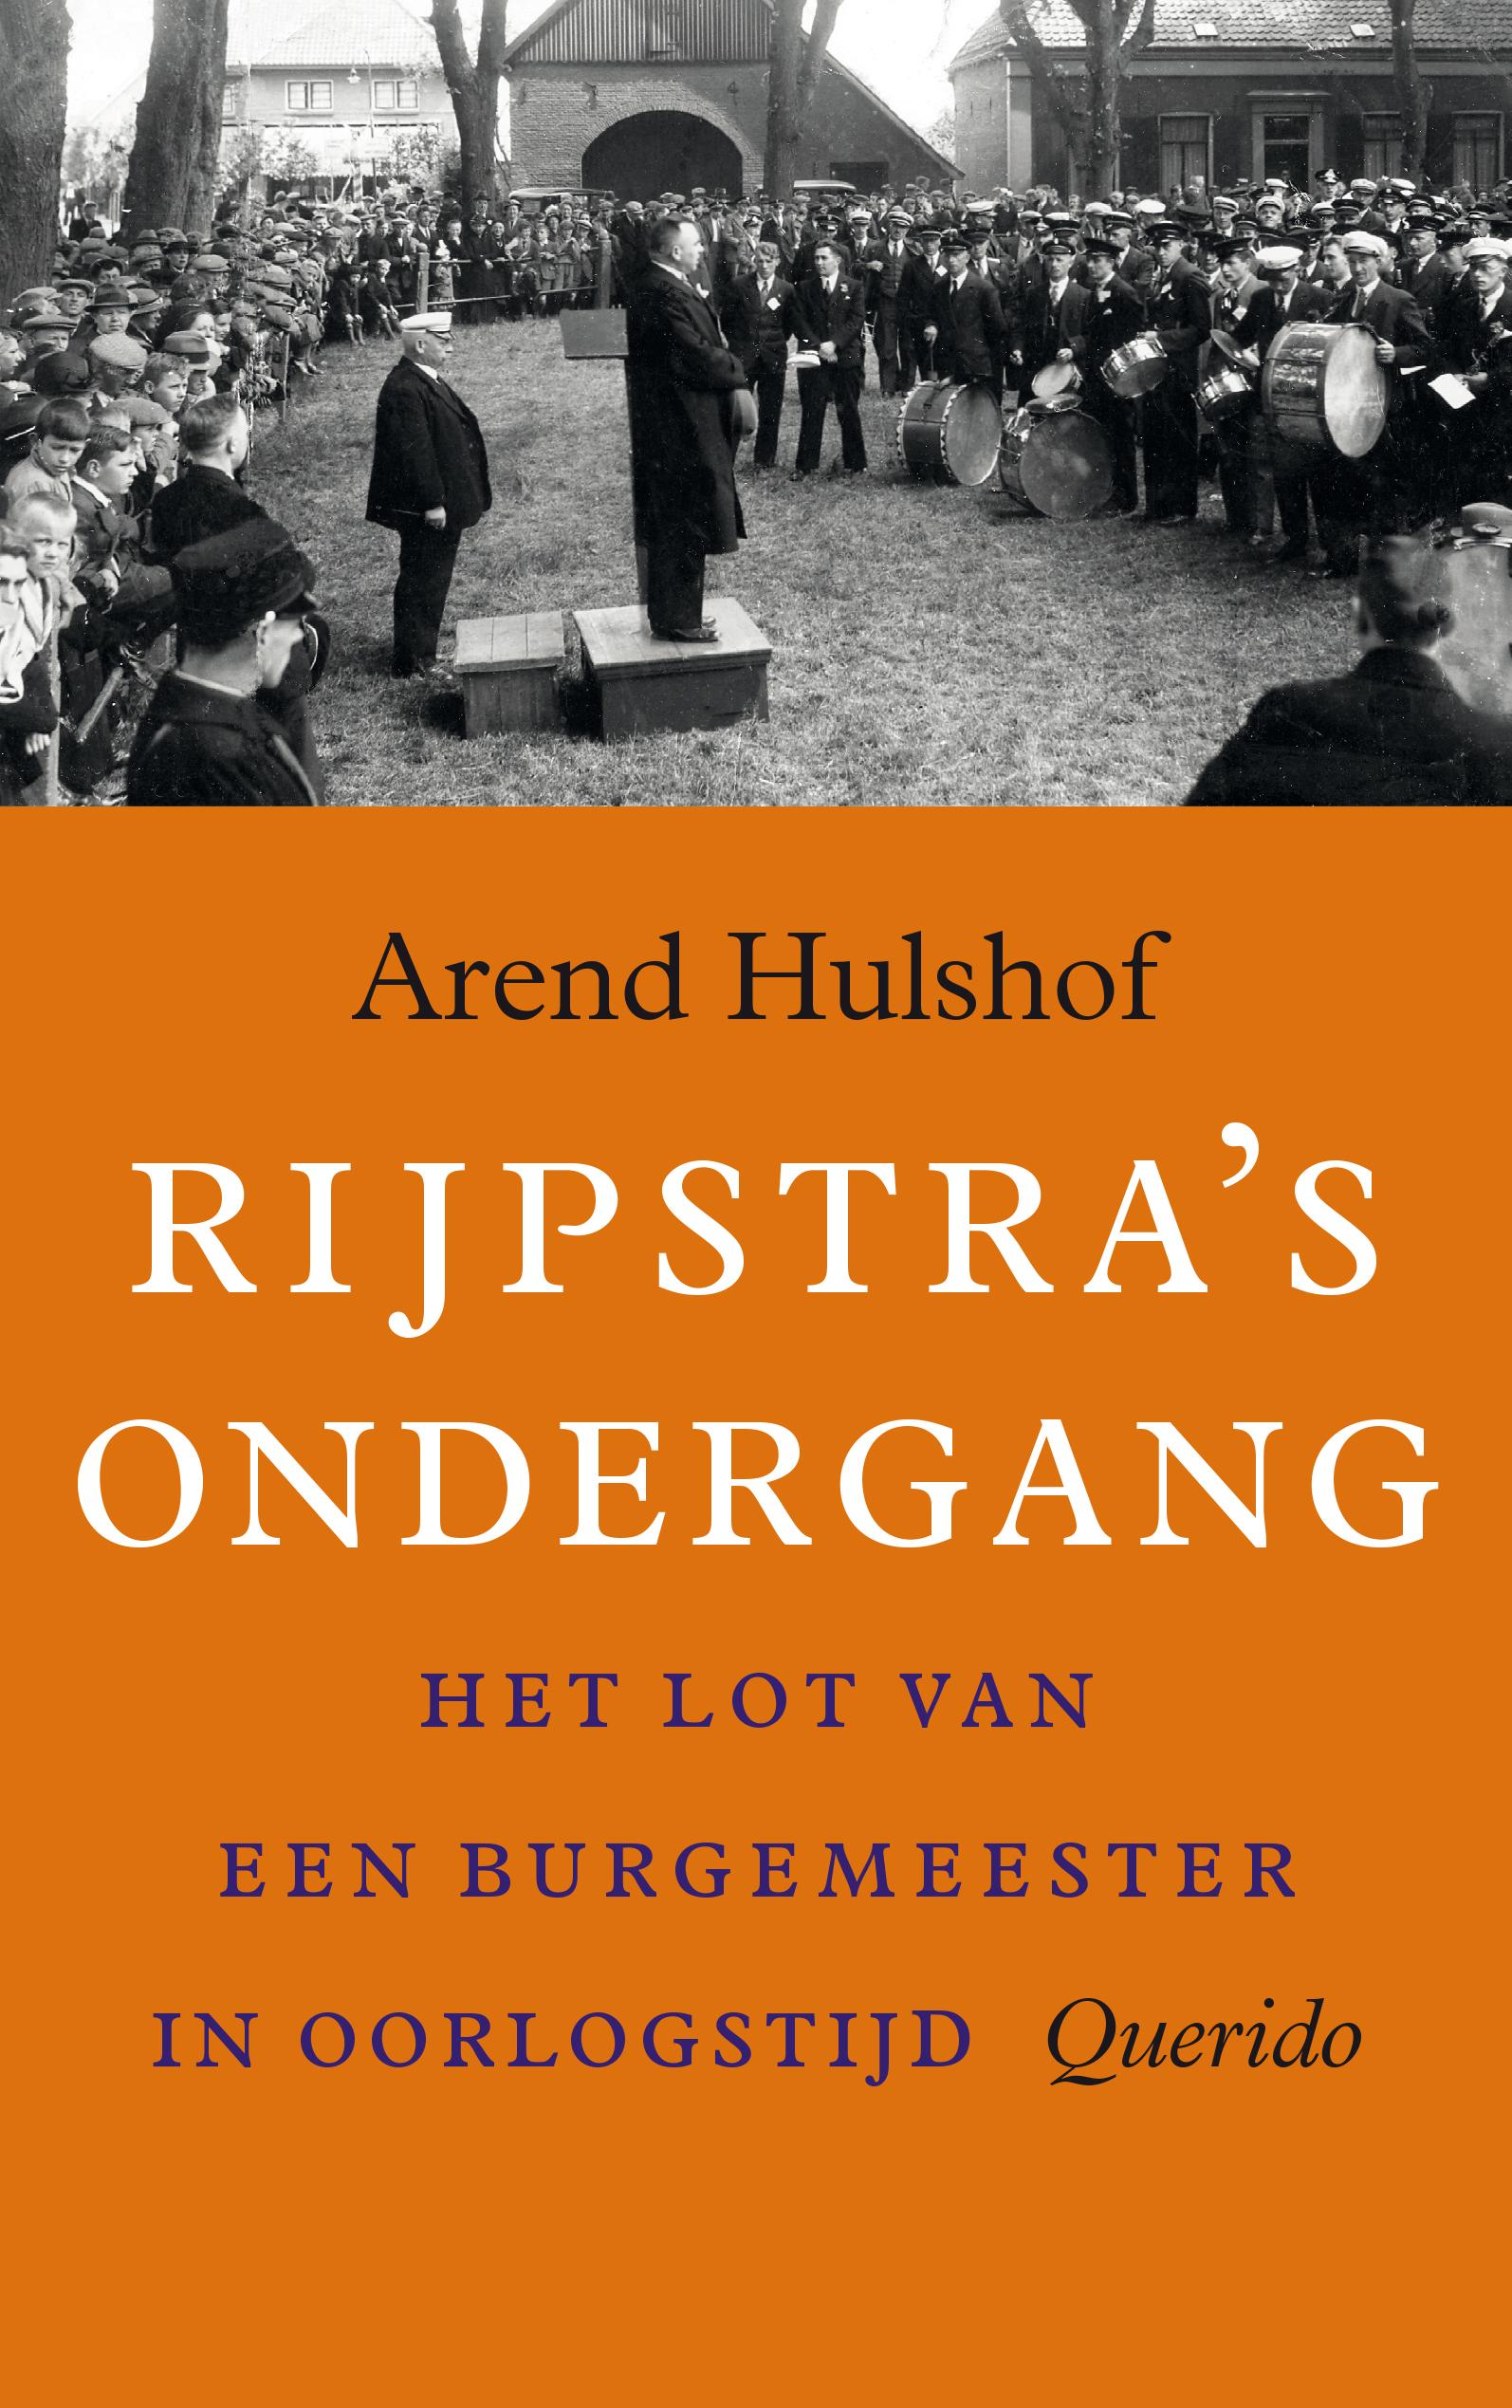 Rijpstra's ondergang – Arend Hulshof